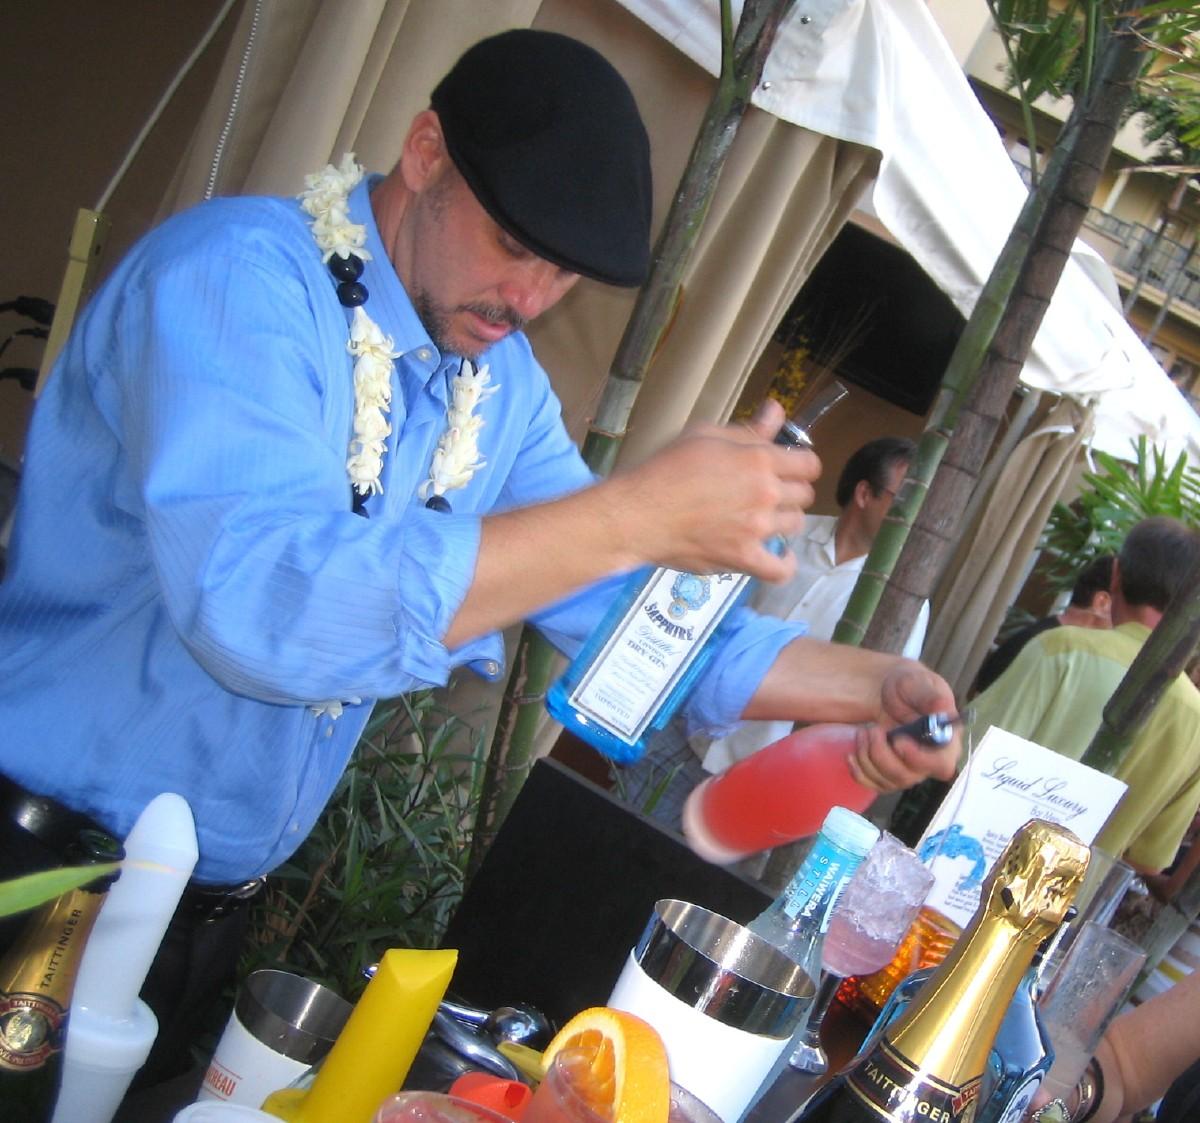 kapalua_wine_and_food_festival_2010